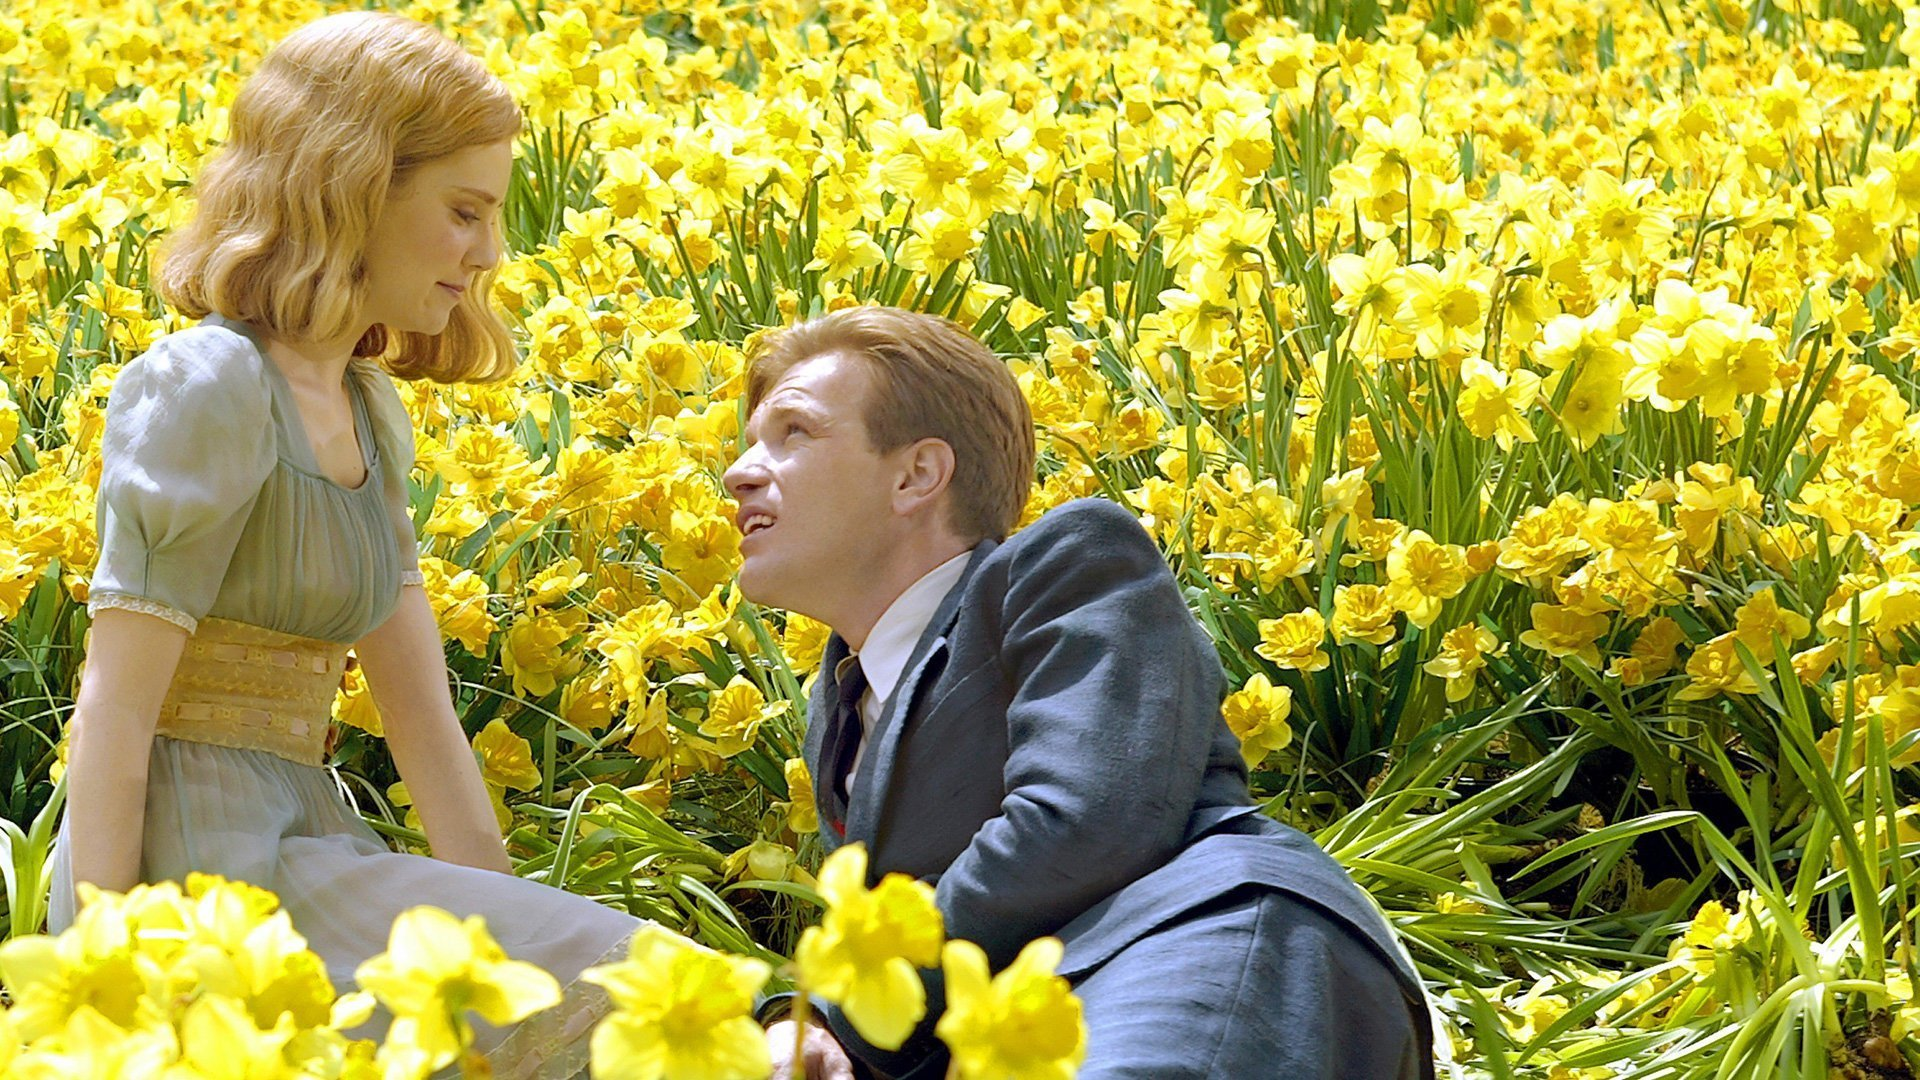 Edward Bloom Rappresenta L'Amore Secondo Tim Burton.